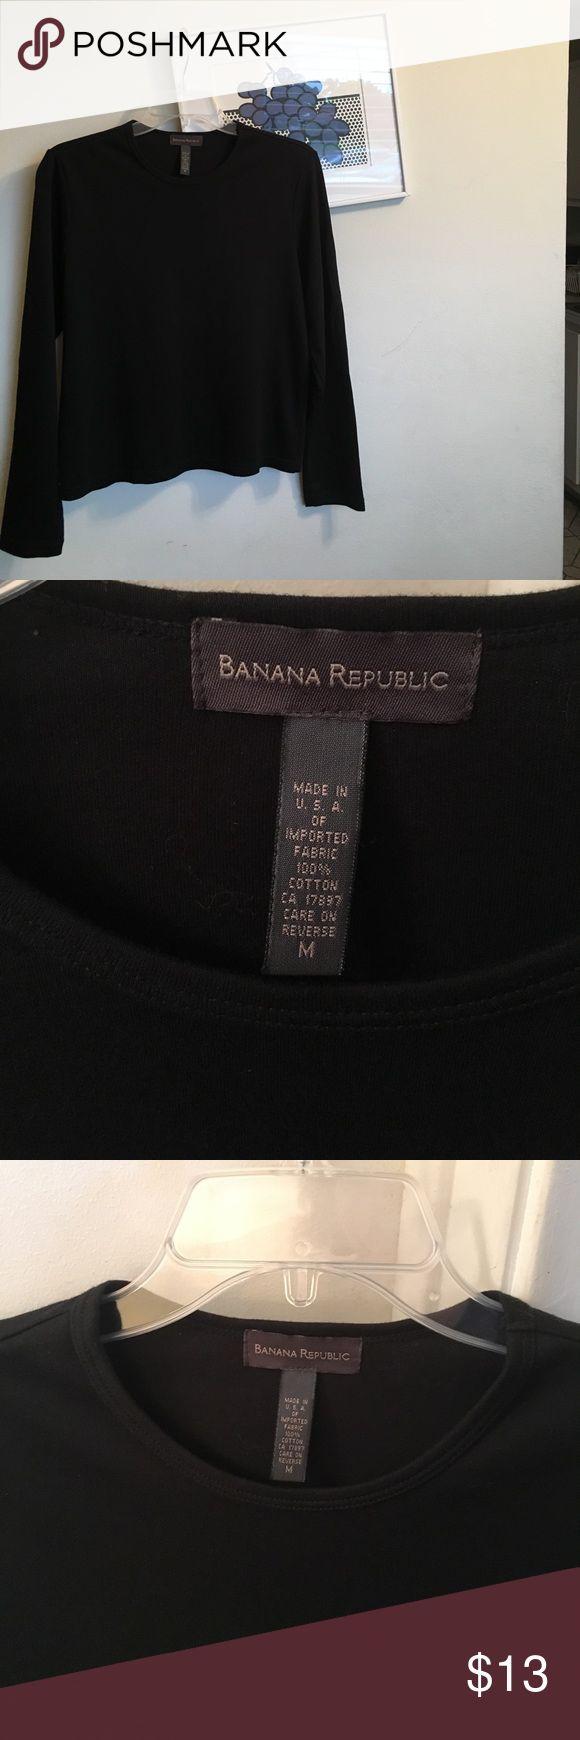 CLASSIC BANANA REPUBLIC BLACK LONG SLEEVE TEE. Classic Banana Republic long sleeve black crew neck tee shirt. Never worn. Size M. Tops Tees - Long Sleeve